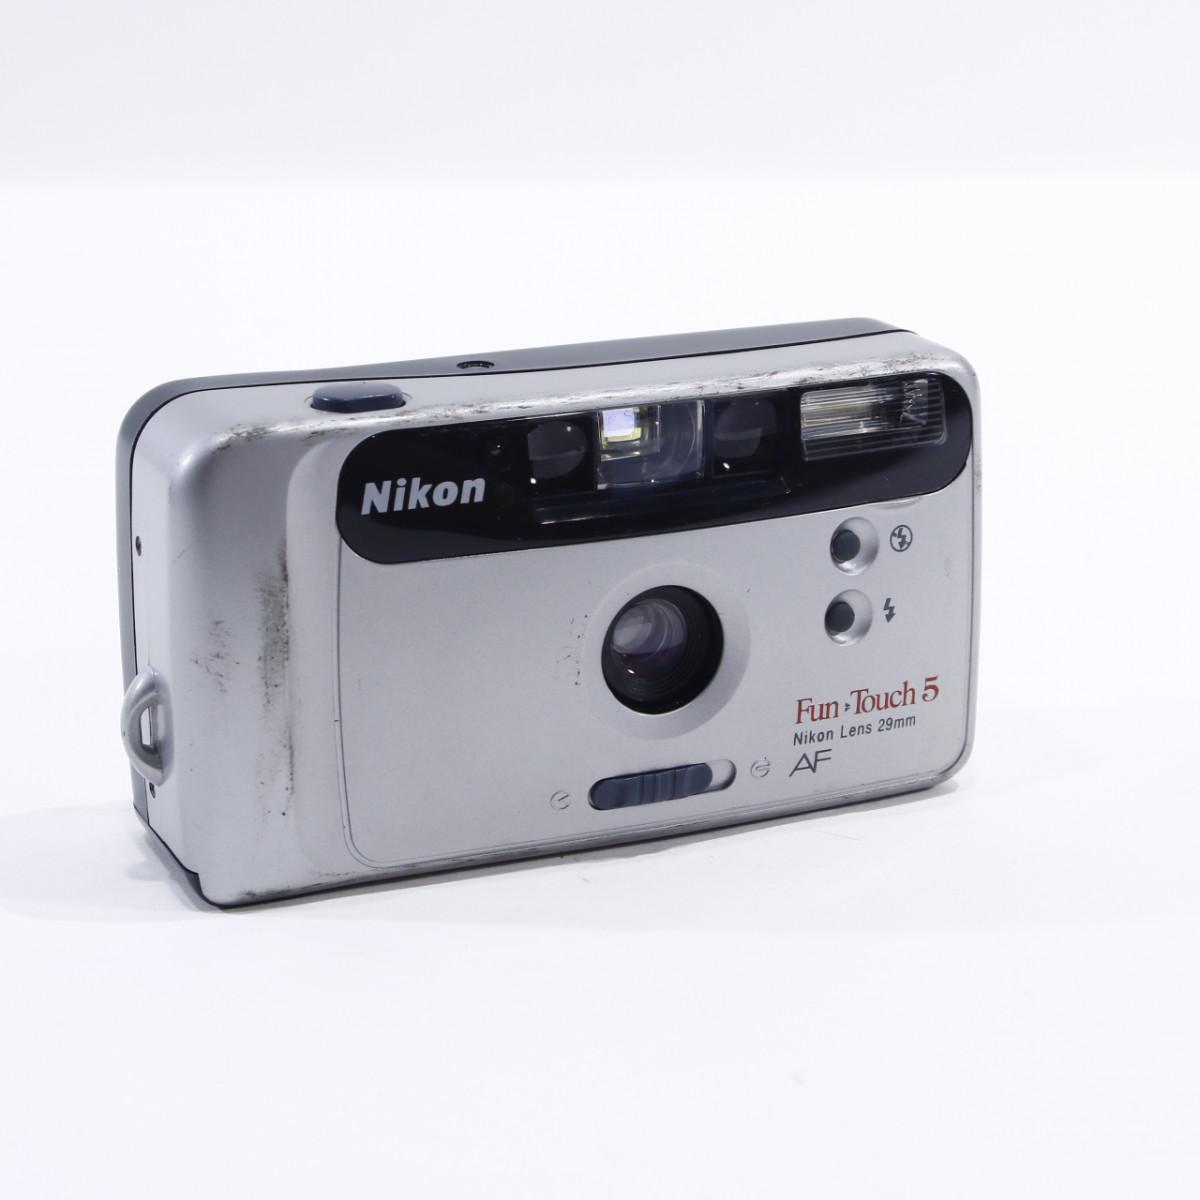 Nikon Fun Touch 5